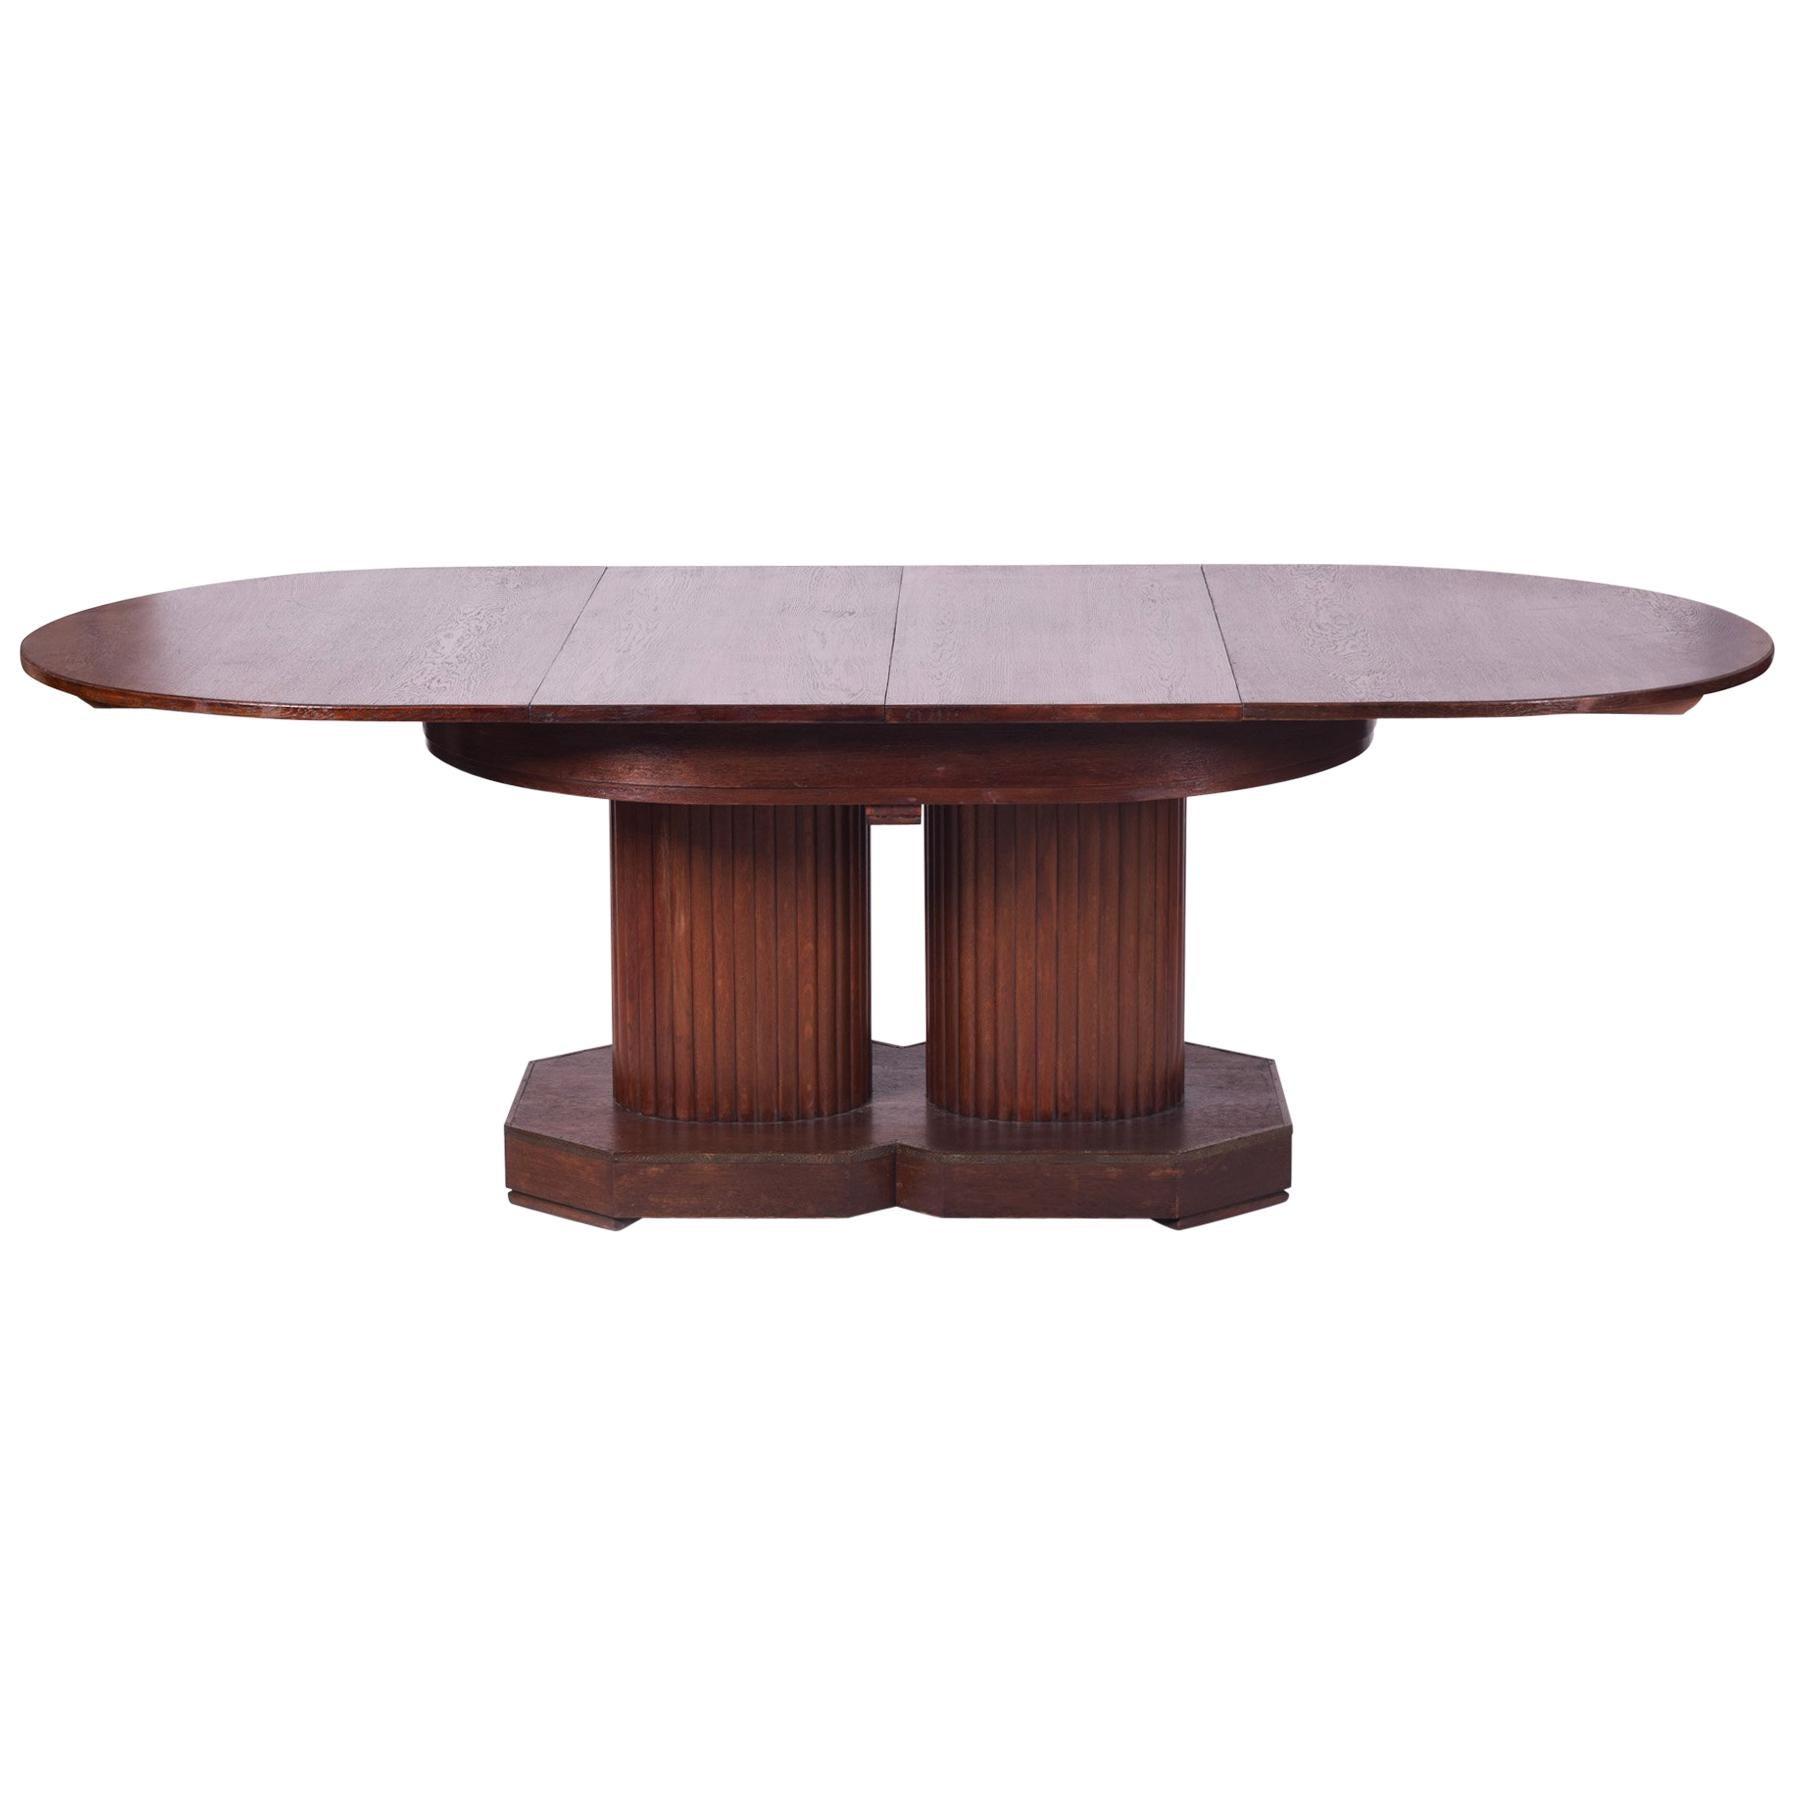 Unique Secession Large Extendable Dining Table, Vienna Secession, Otto  Prutscher For Sale